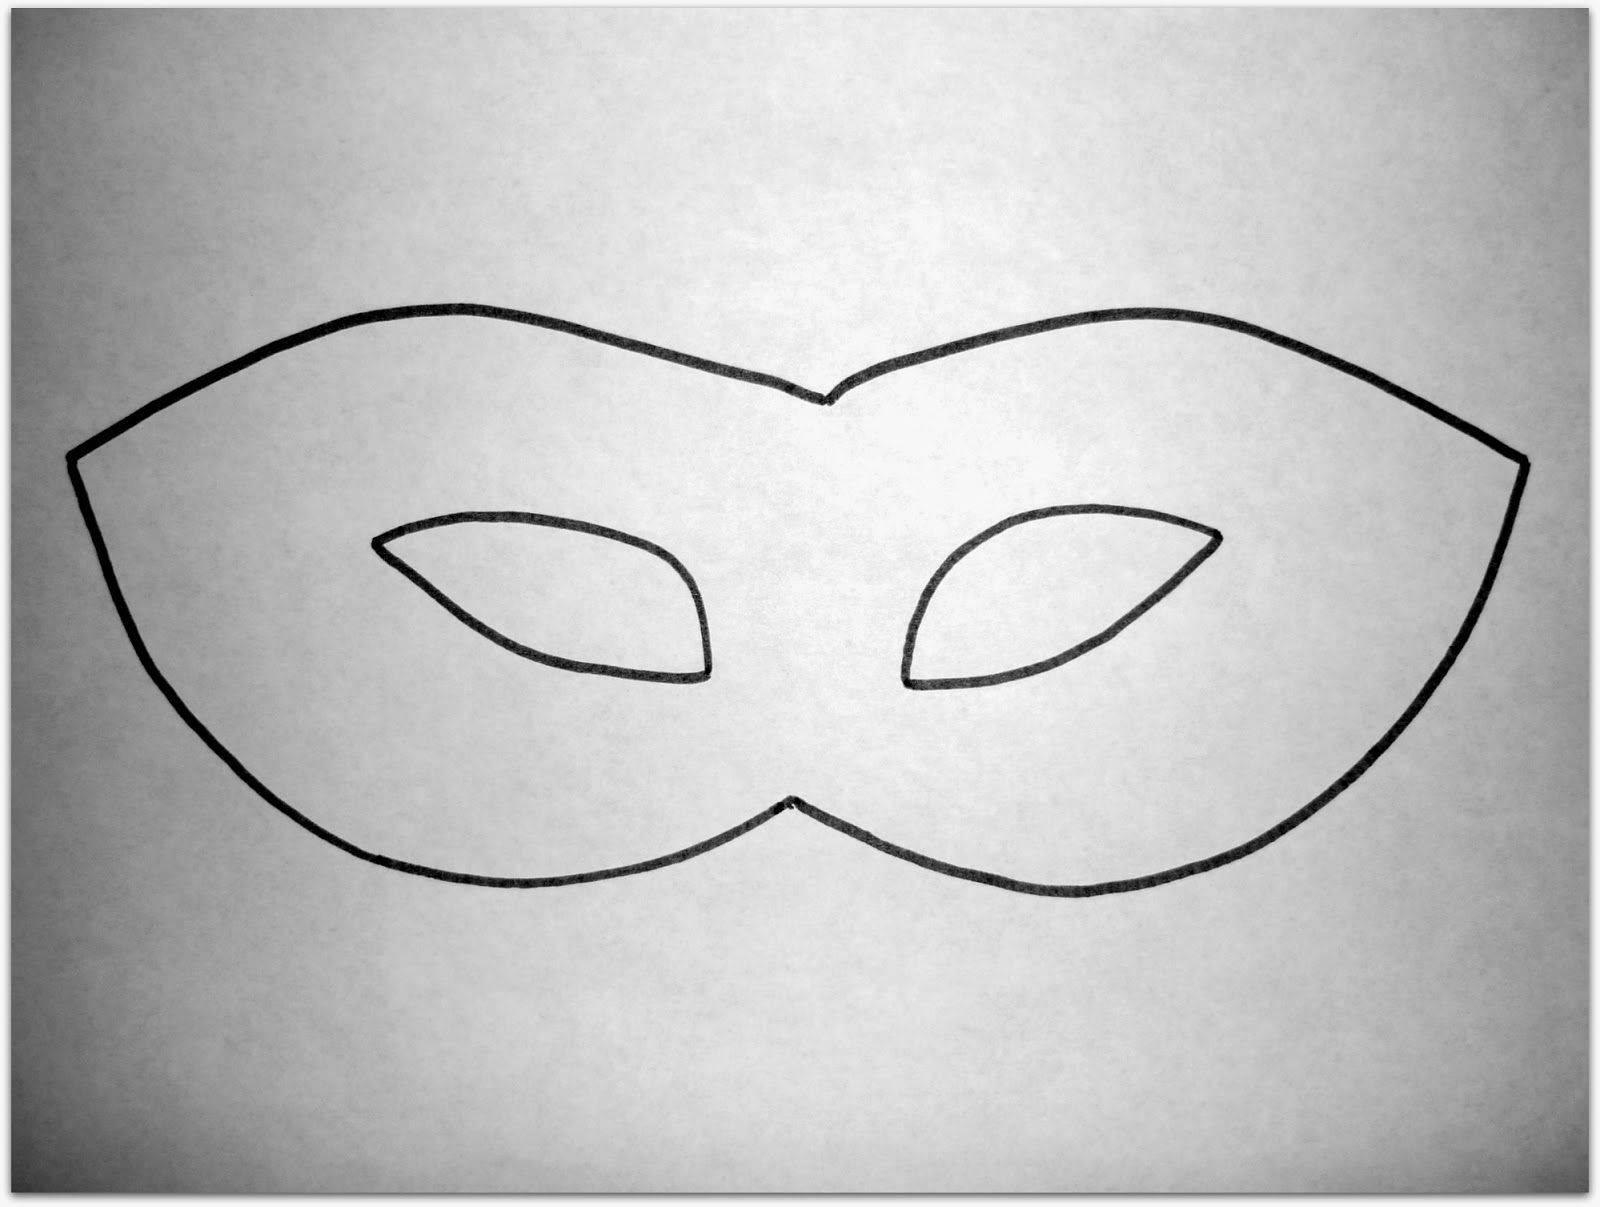 Masquerade Masks Invitations Templates